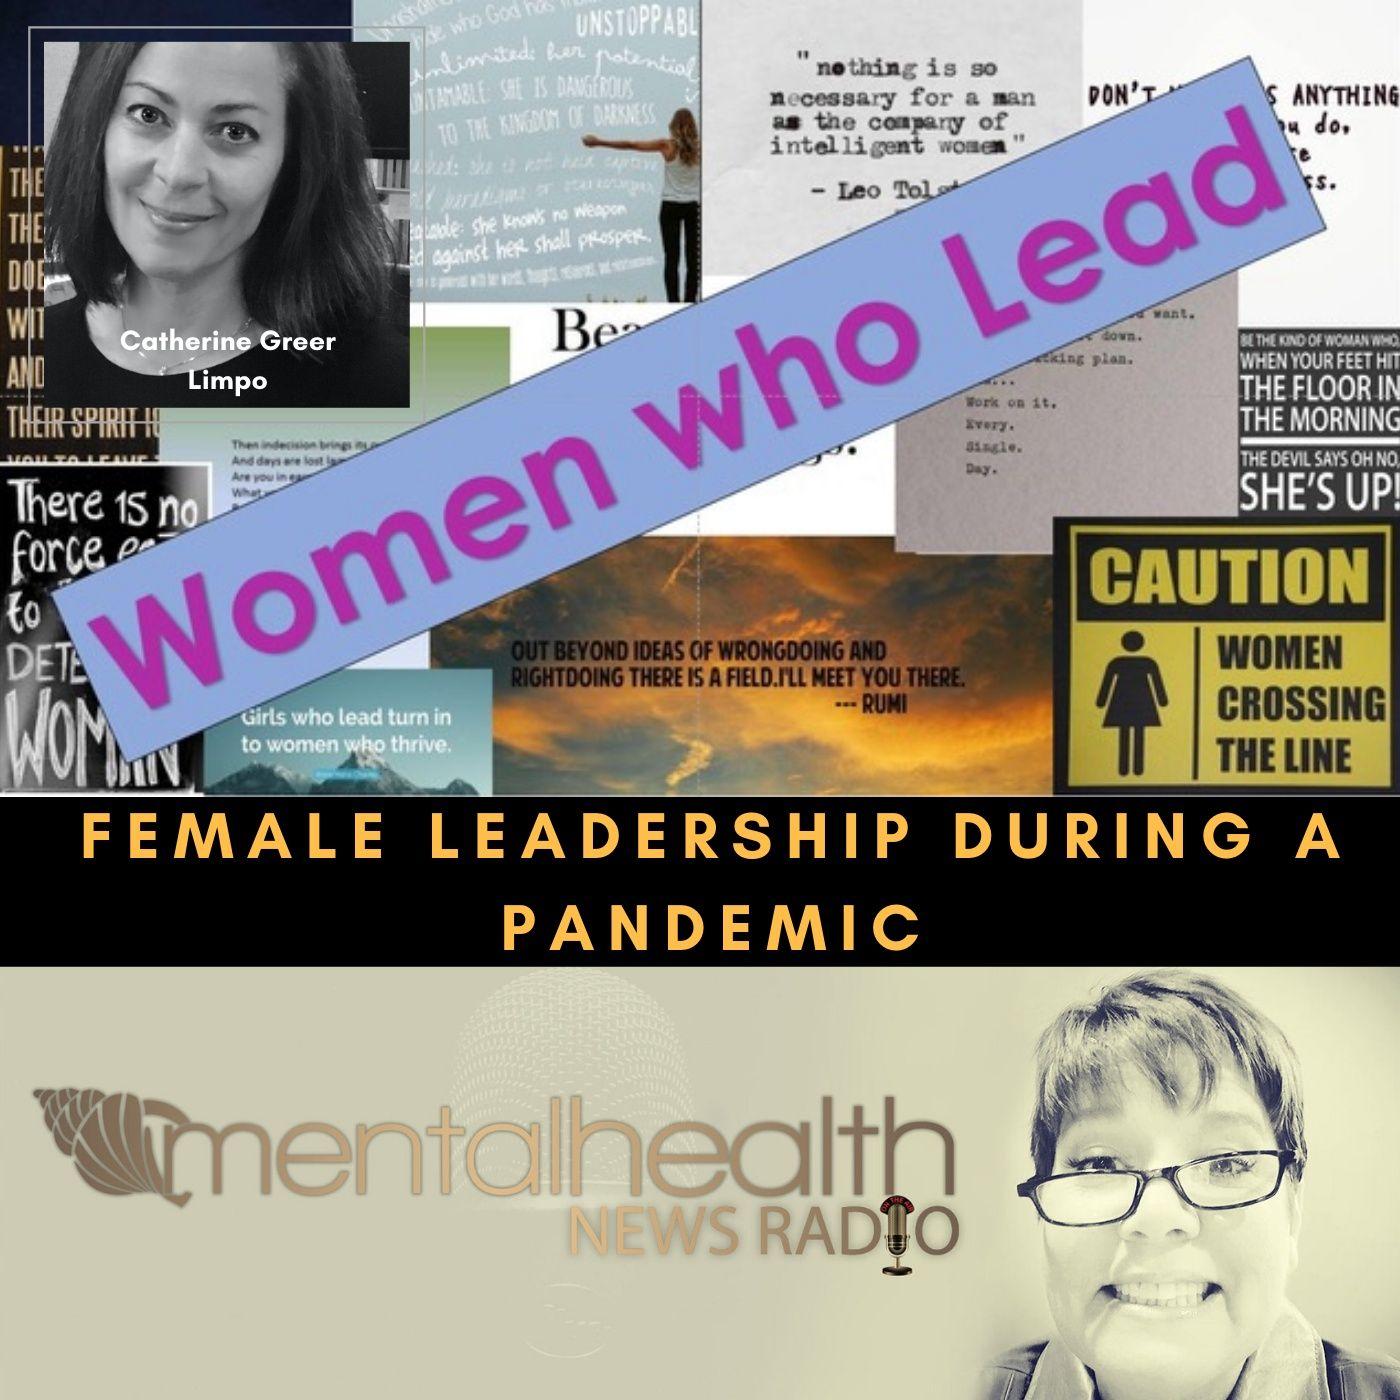 Mental Health News Radio - Female Leadership Through Covid-19